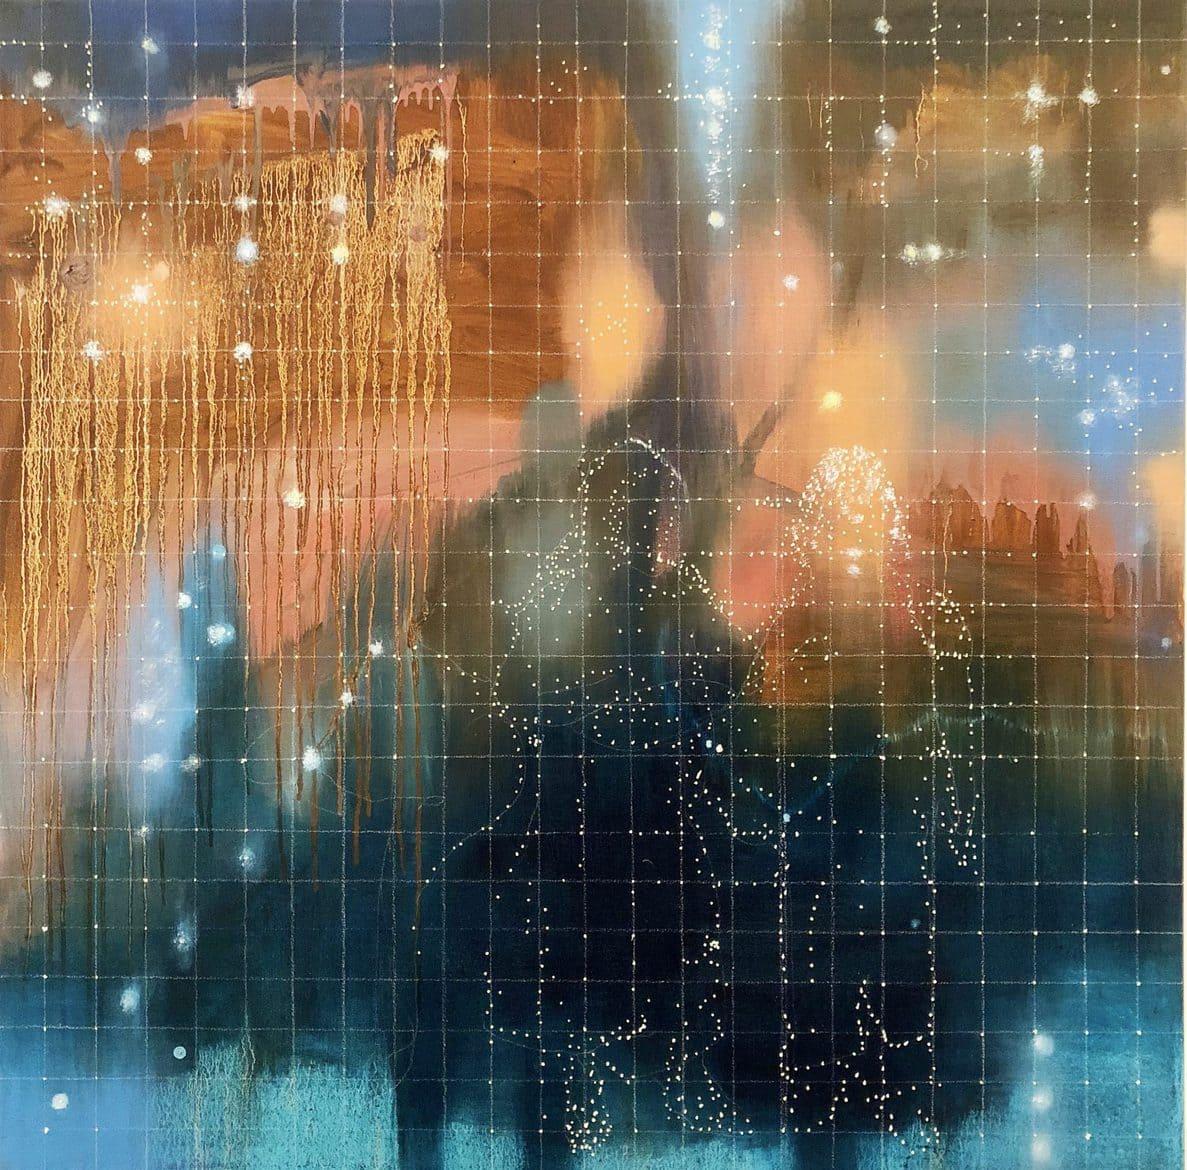 Jon Cattapan, 'Constellation Study', 2018, Oil on linen, 100 x 100 cm